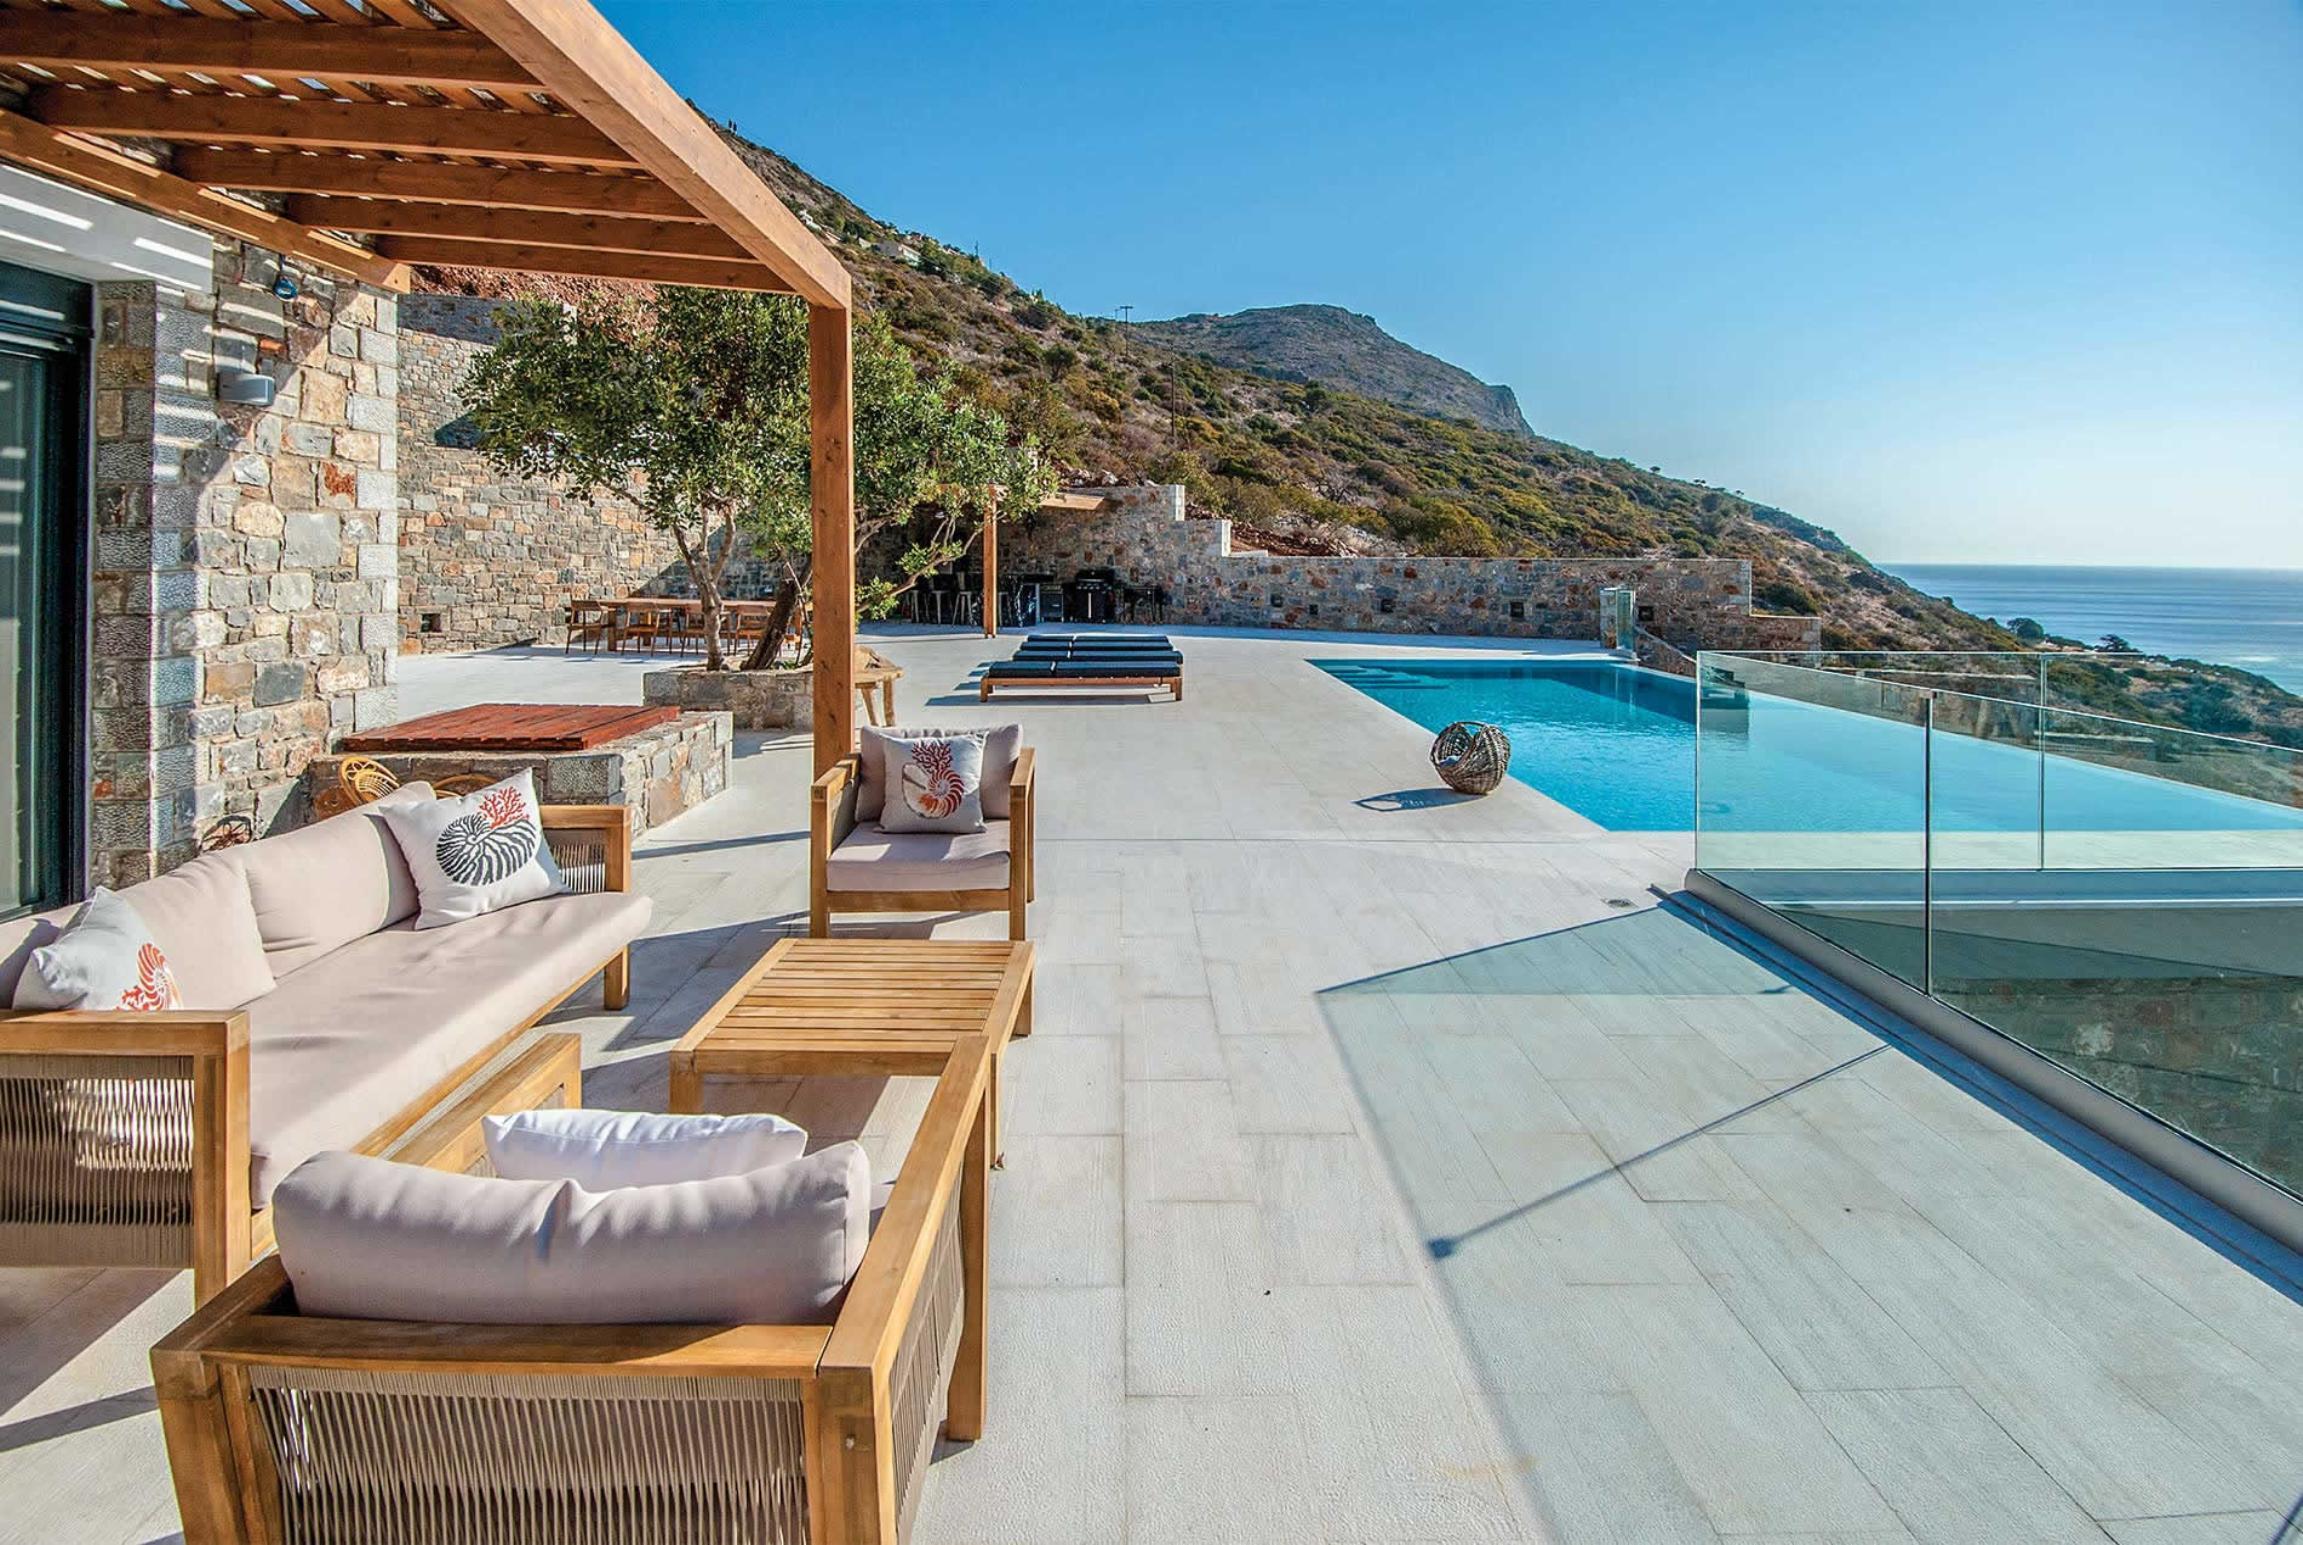 Ferienhaus Gina (2654193), Plaka, Kreta Nordküste, Kreta, Griechenland, Bild 13